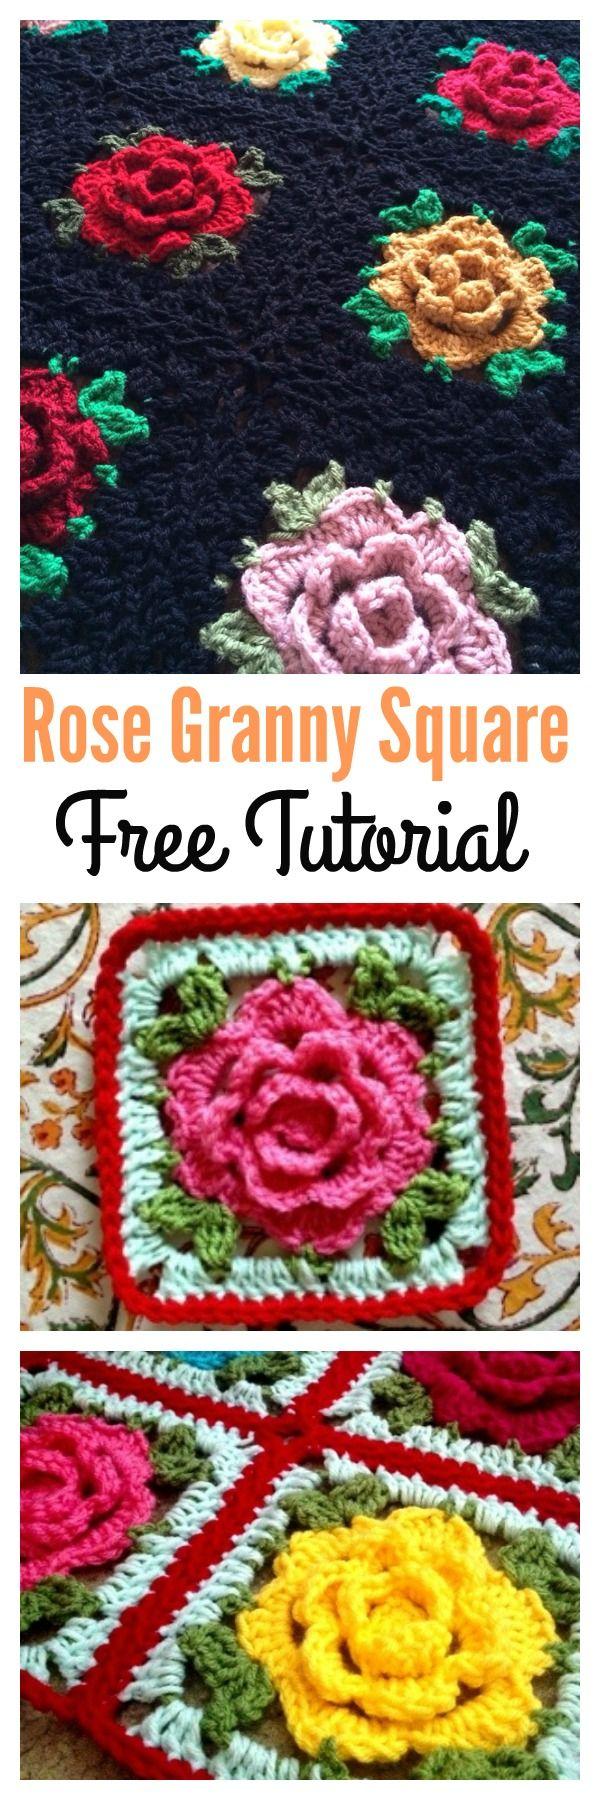 Crochet Rose Granny Square Afghan Free Patterns   Häkeln, Blüten und ...